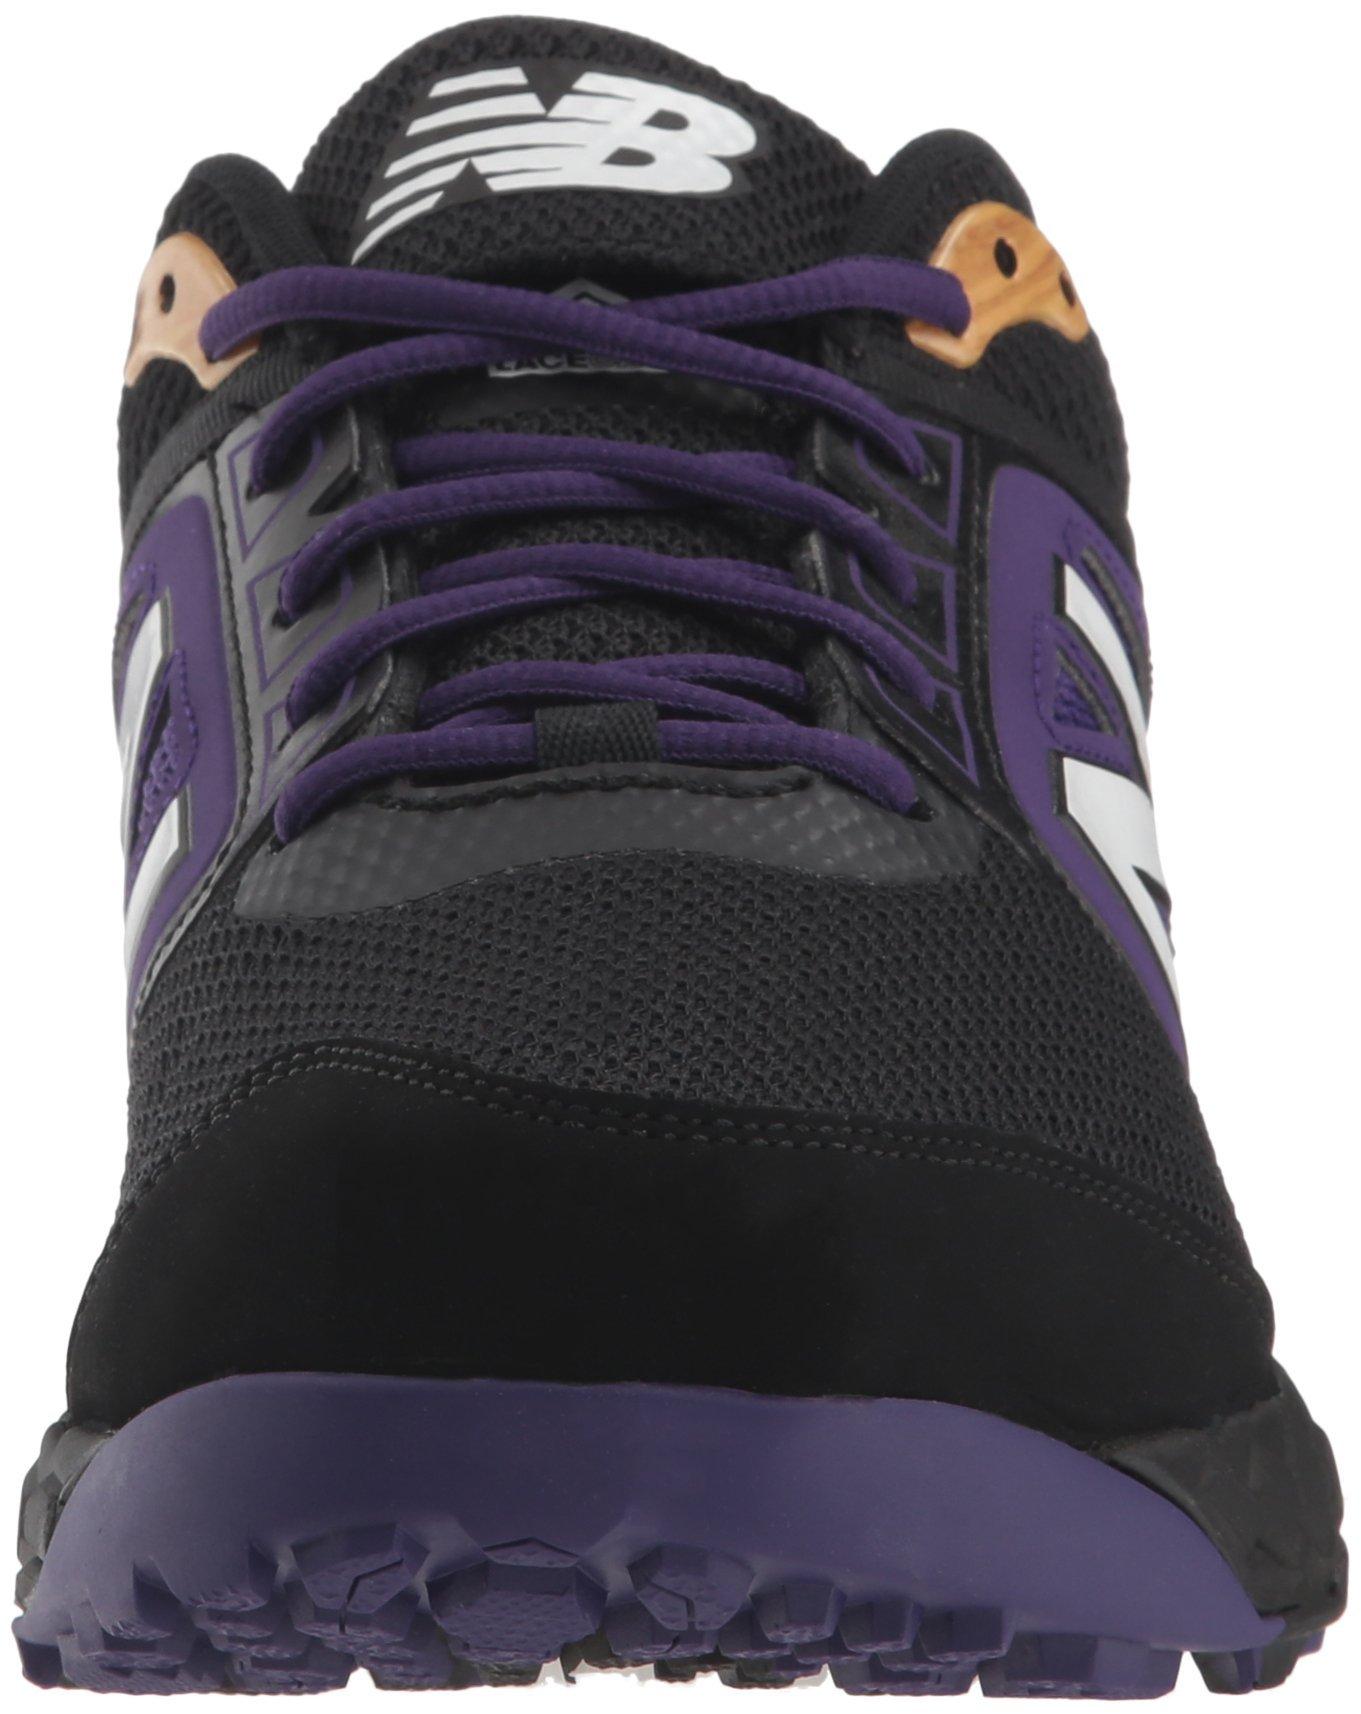 New Balance Men's 3000v4 Turf Baseball Shoe, Black/Purple, 5 D US by New Balance (Image #4)